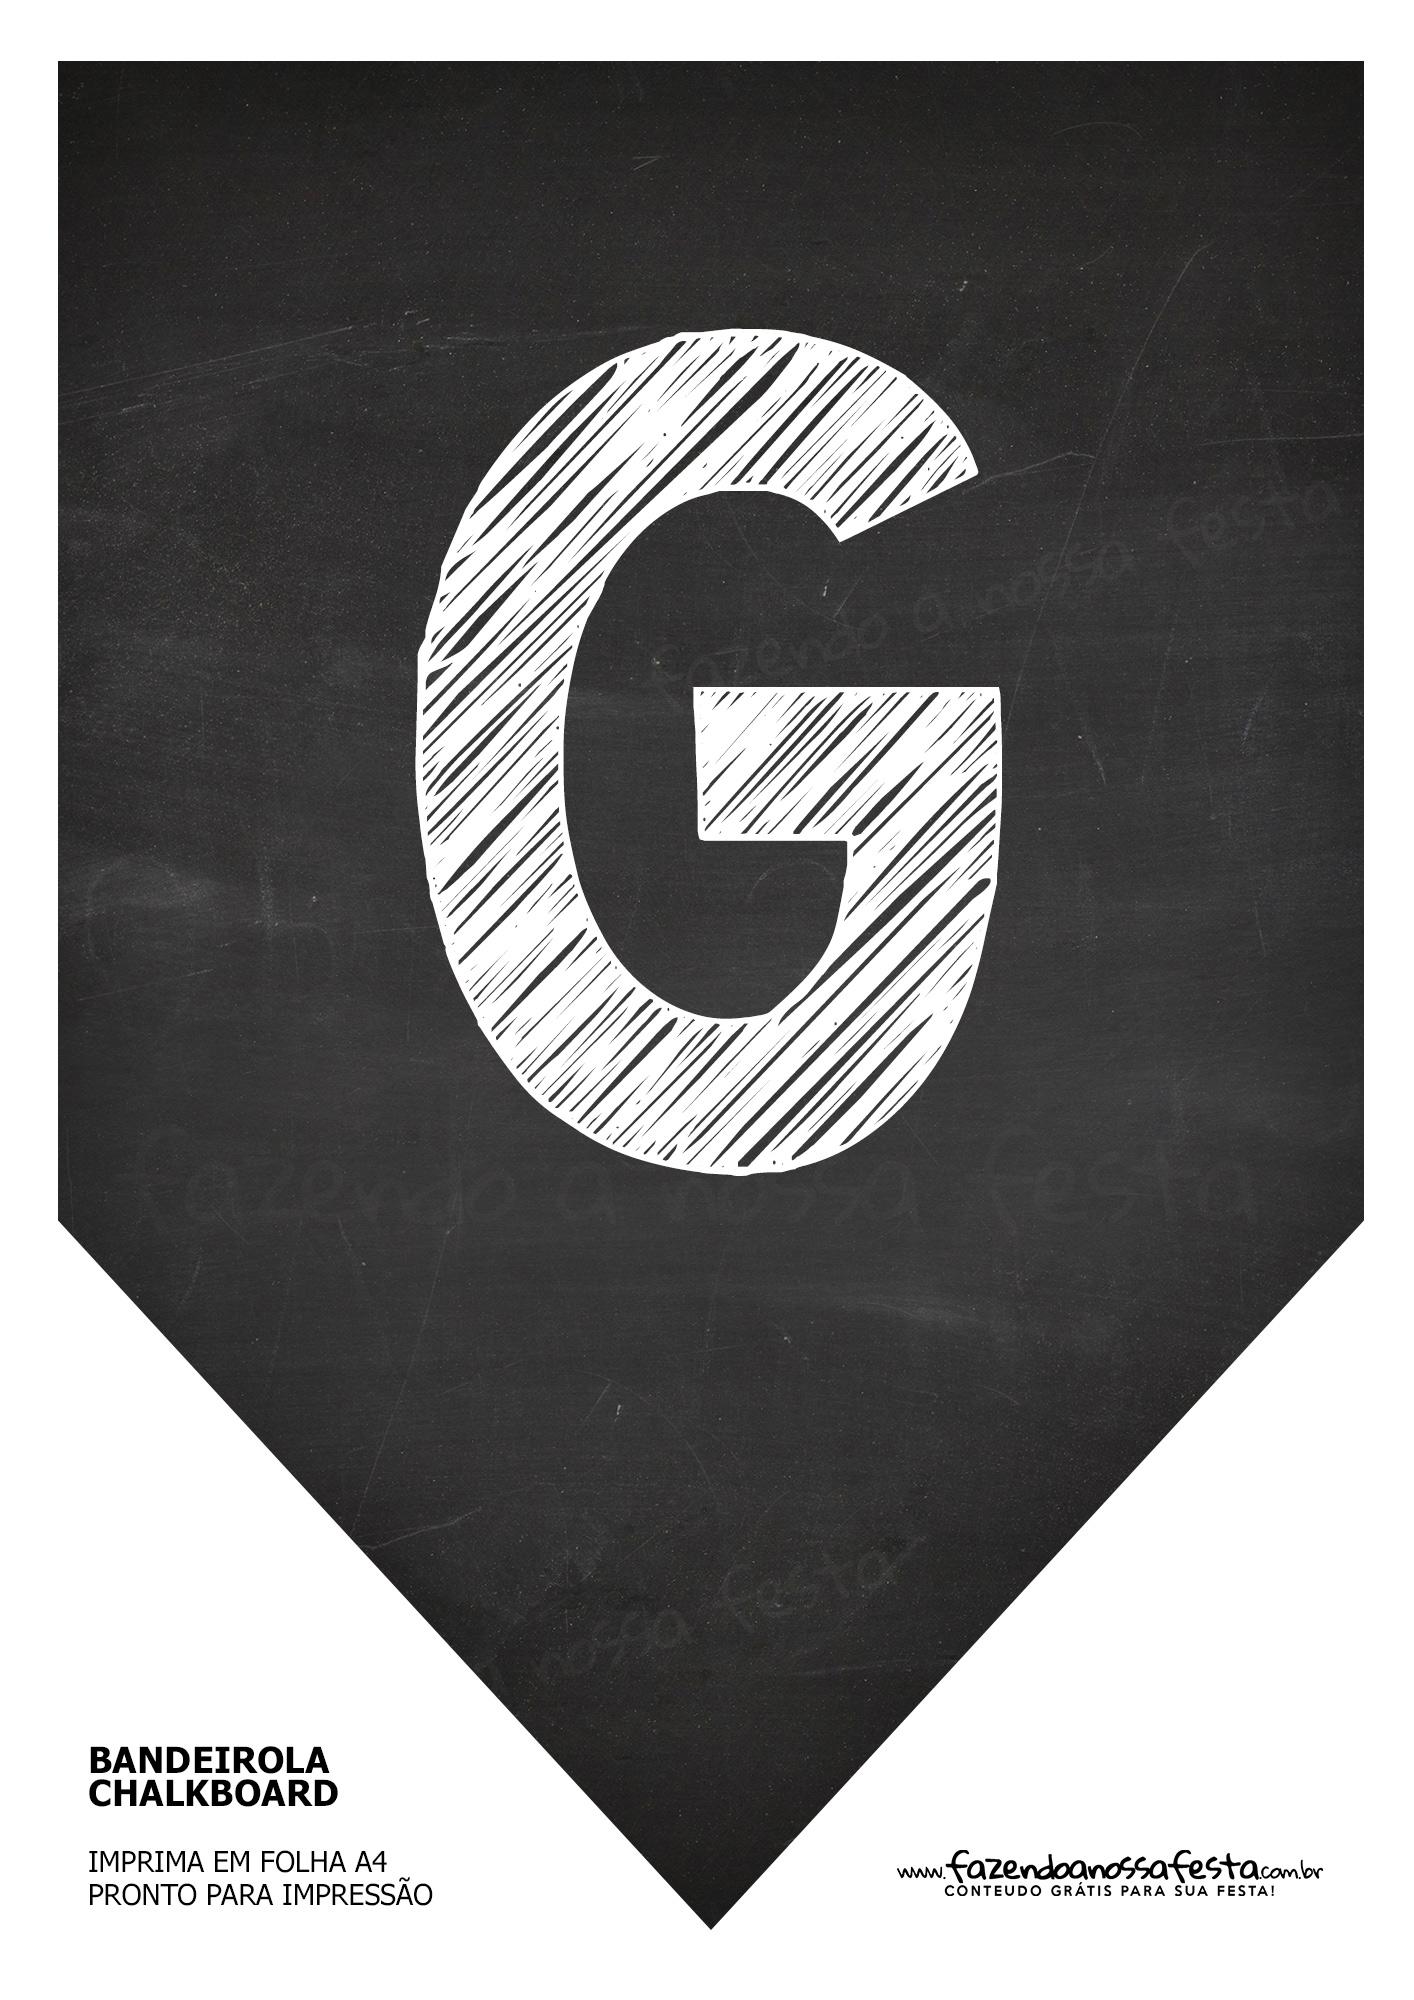 Bandeirolas Chalkboard G